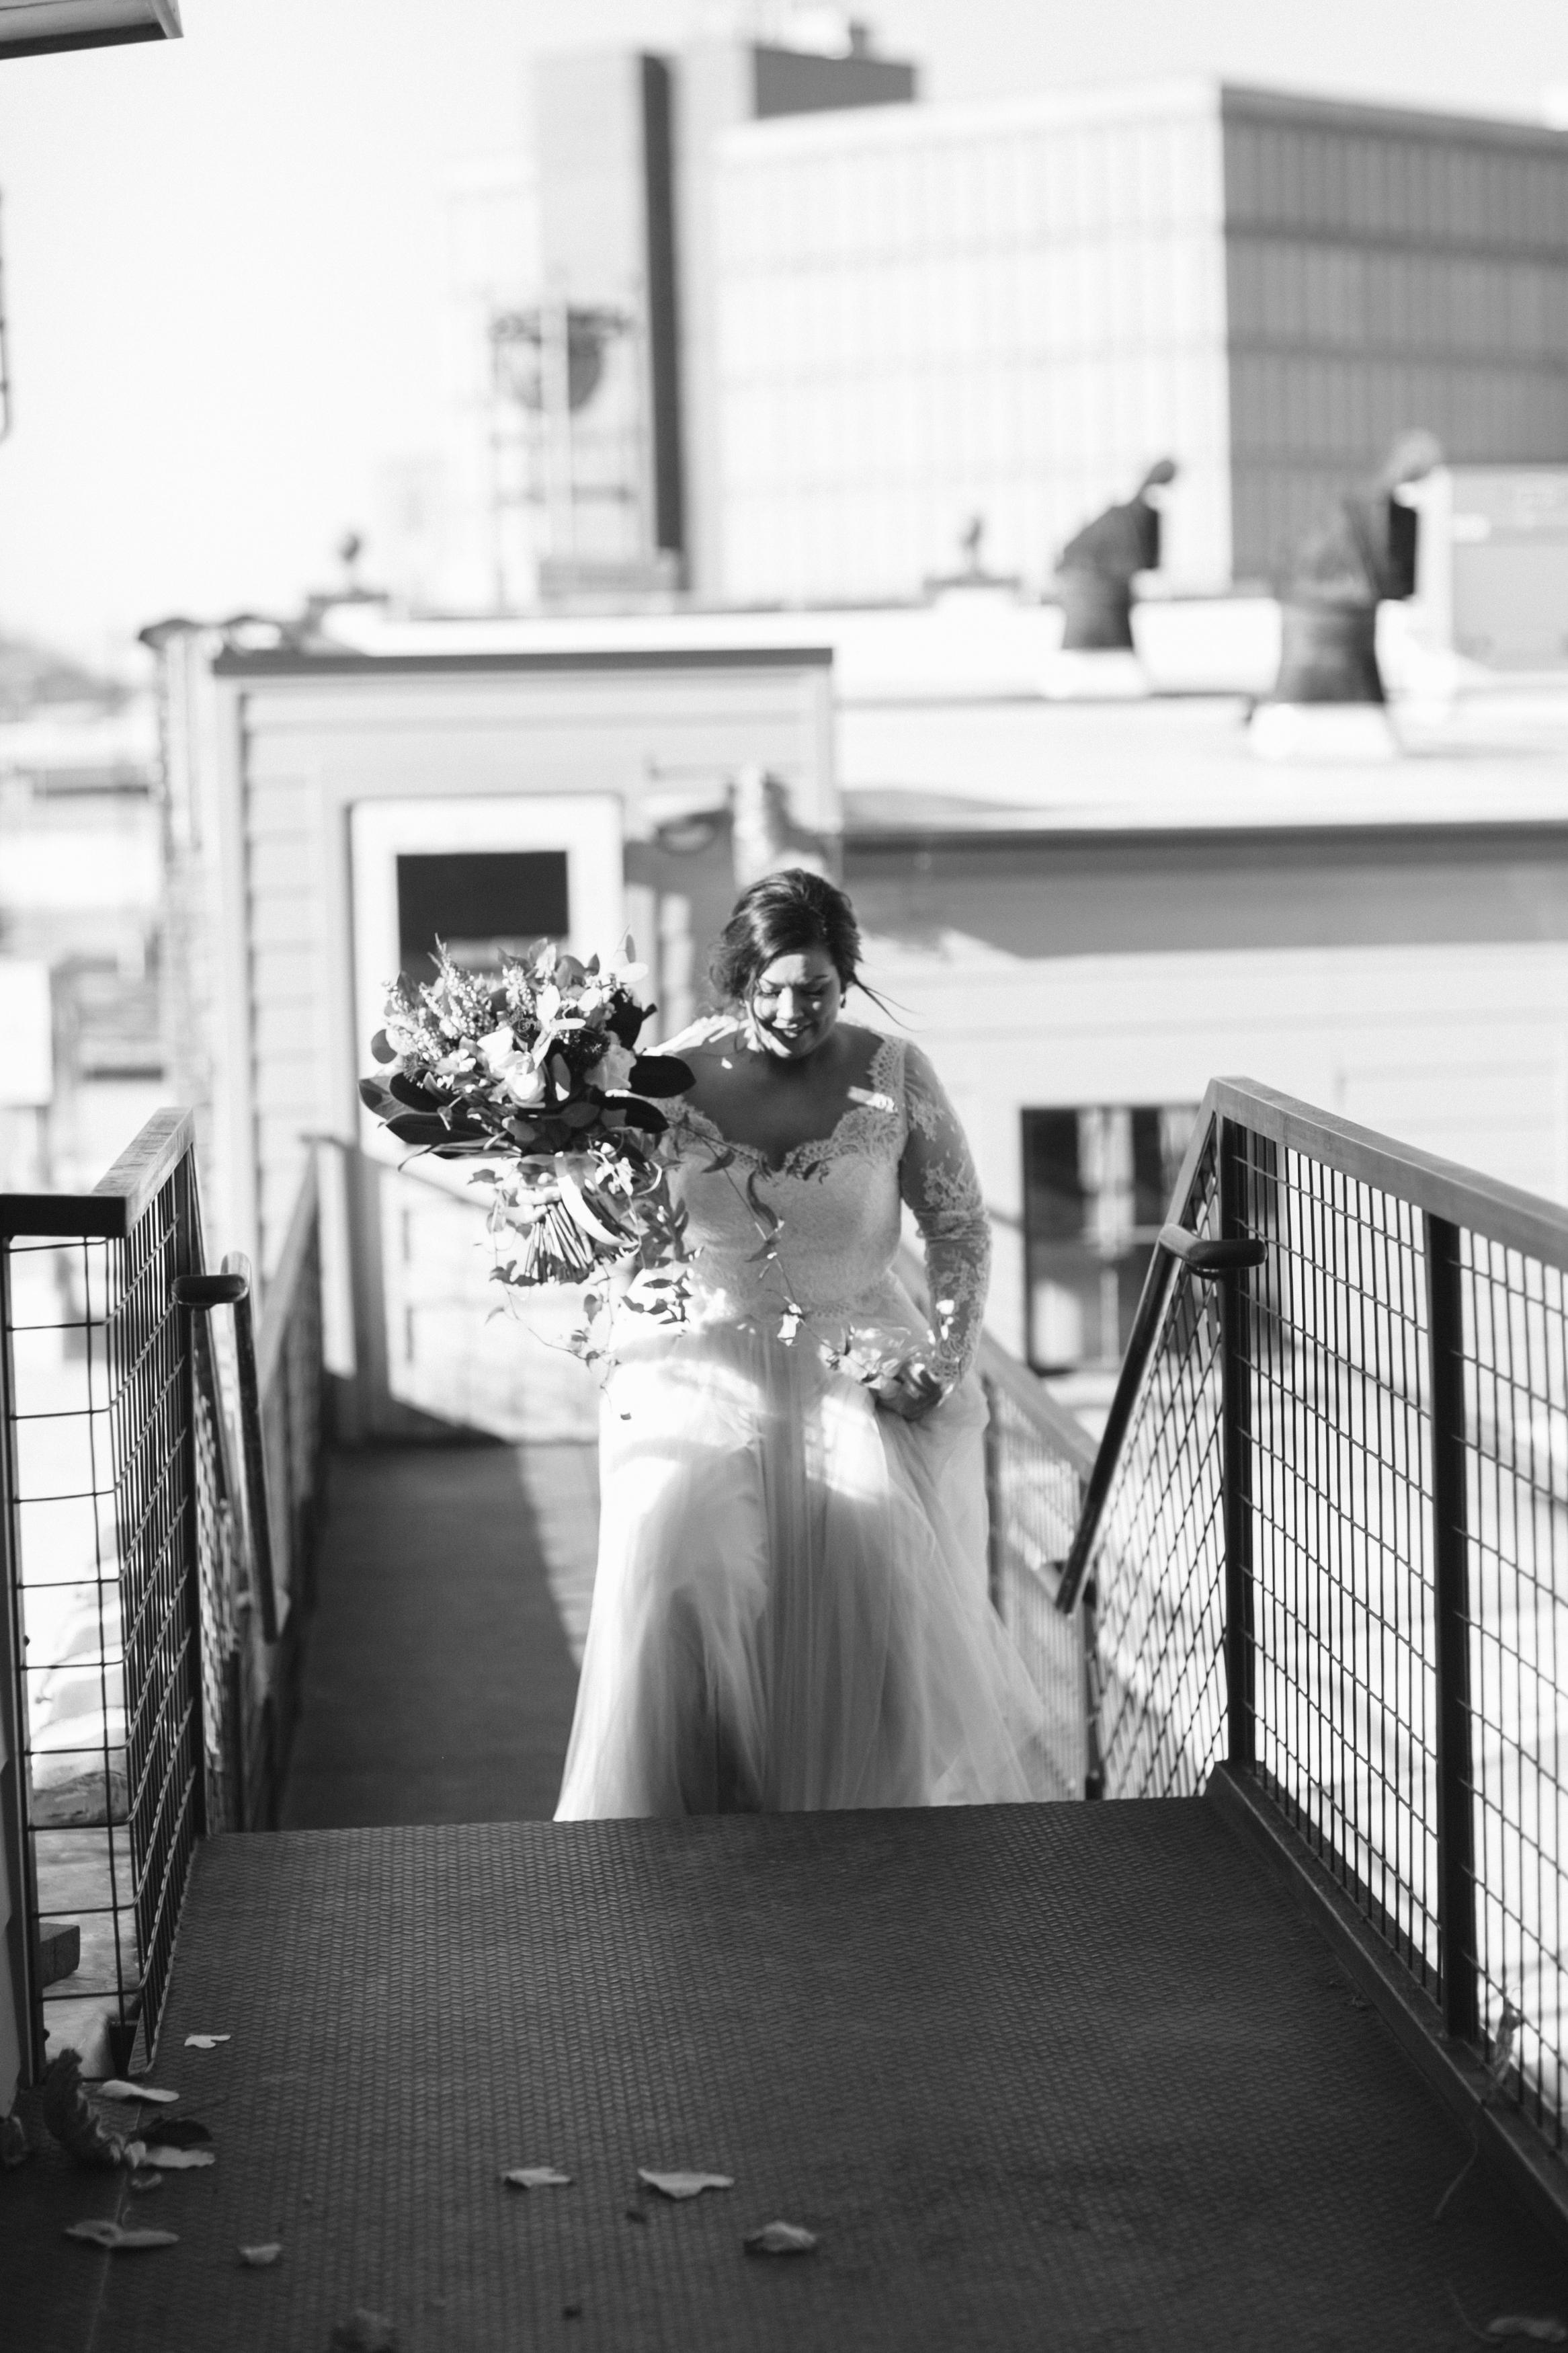 Lauren_Jeremy_Standard_Wedding_Knoxville_Abigail_Malone_Photography_FIlm-167.jpg